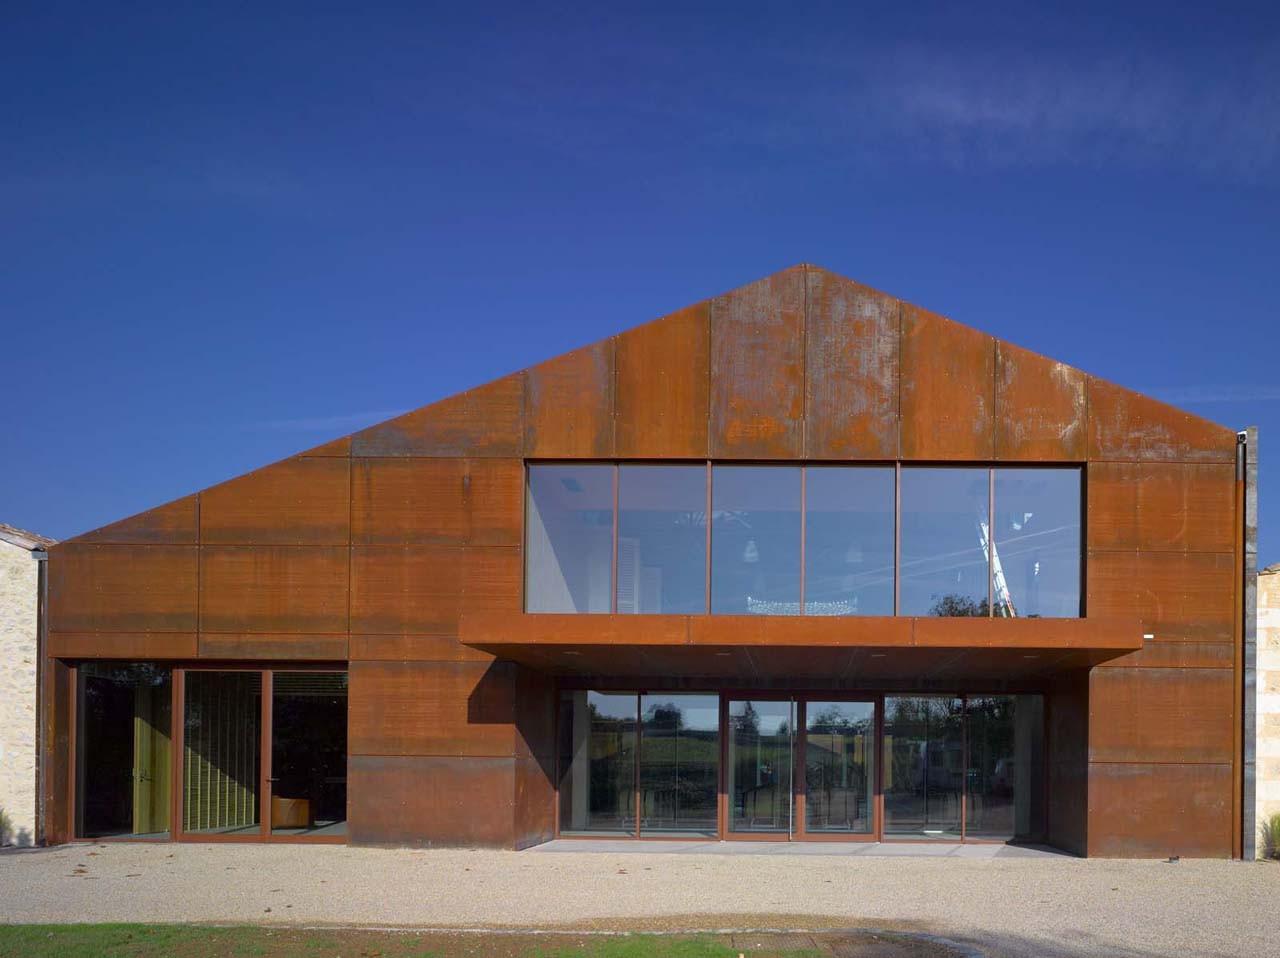 Viña Chateau Barde-Haut / Nadau Lavergne Architects, © Philippe Caumes